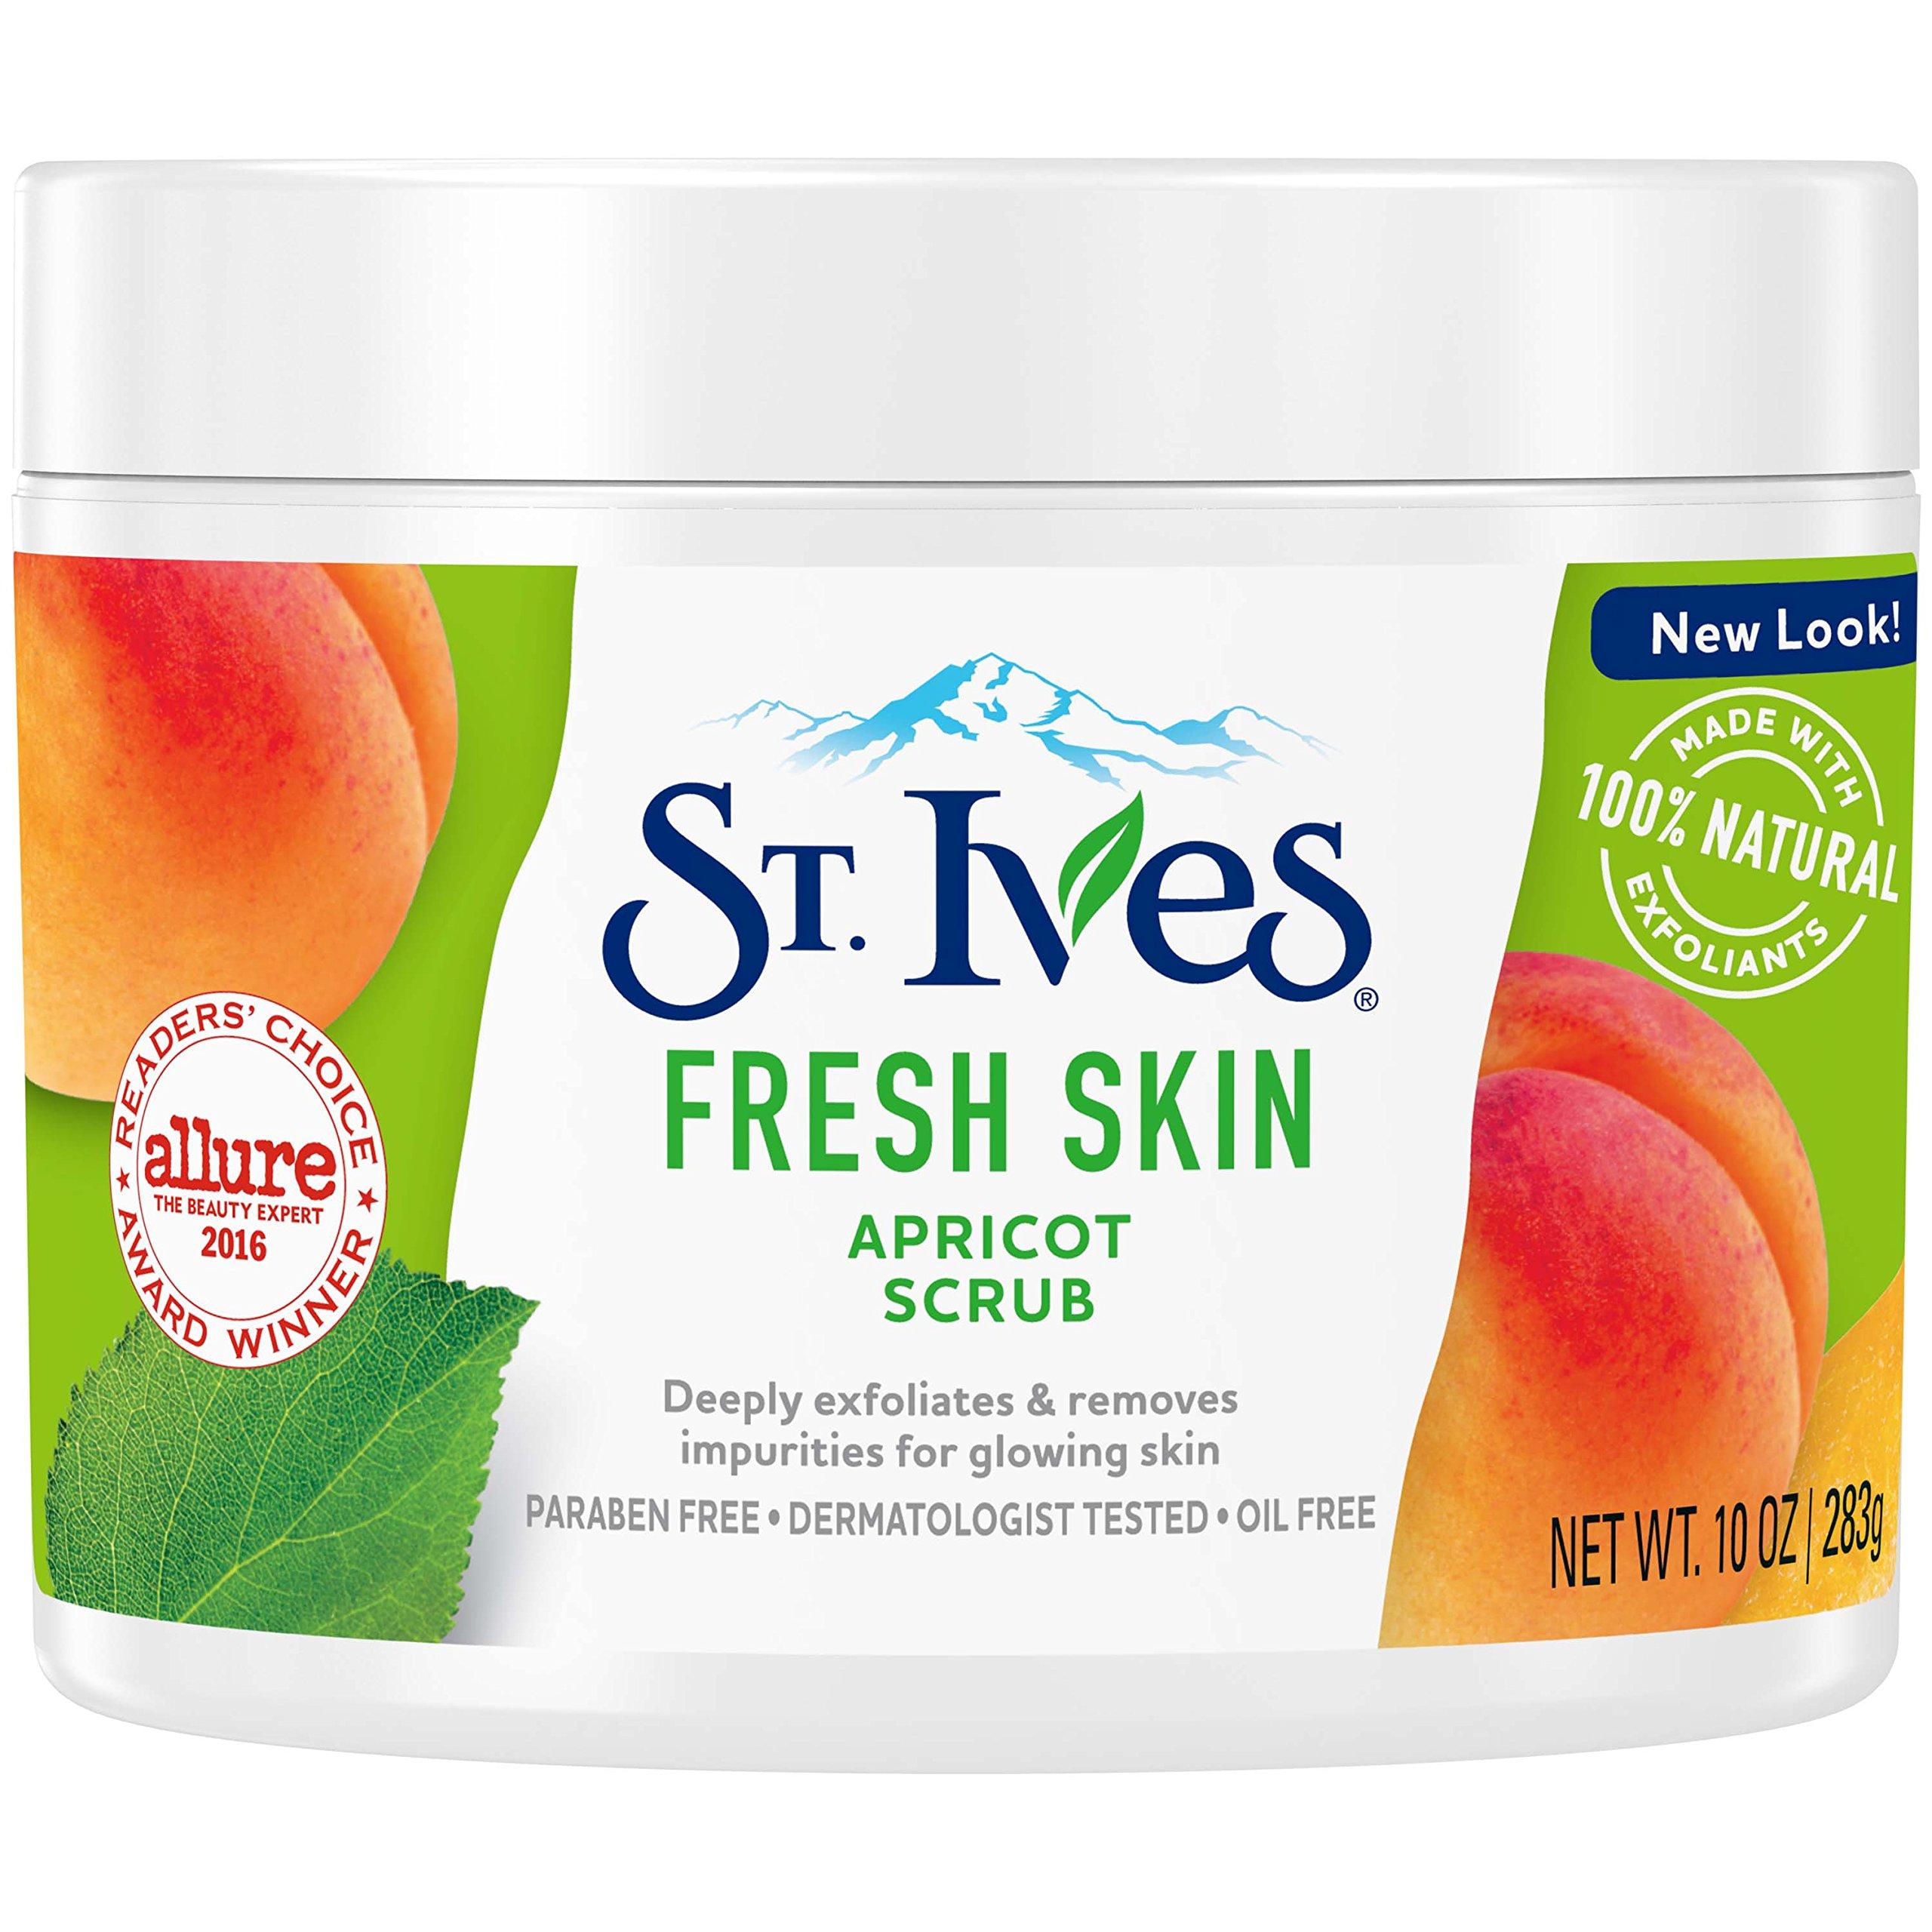 Fresh facial scrub